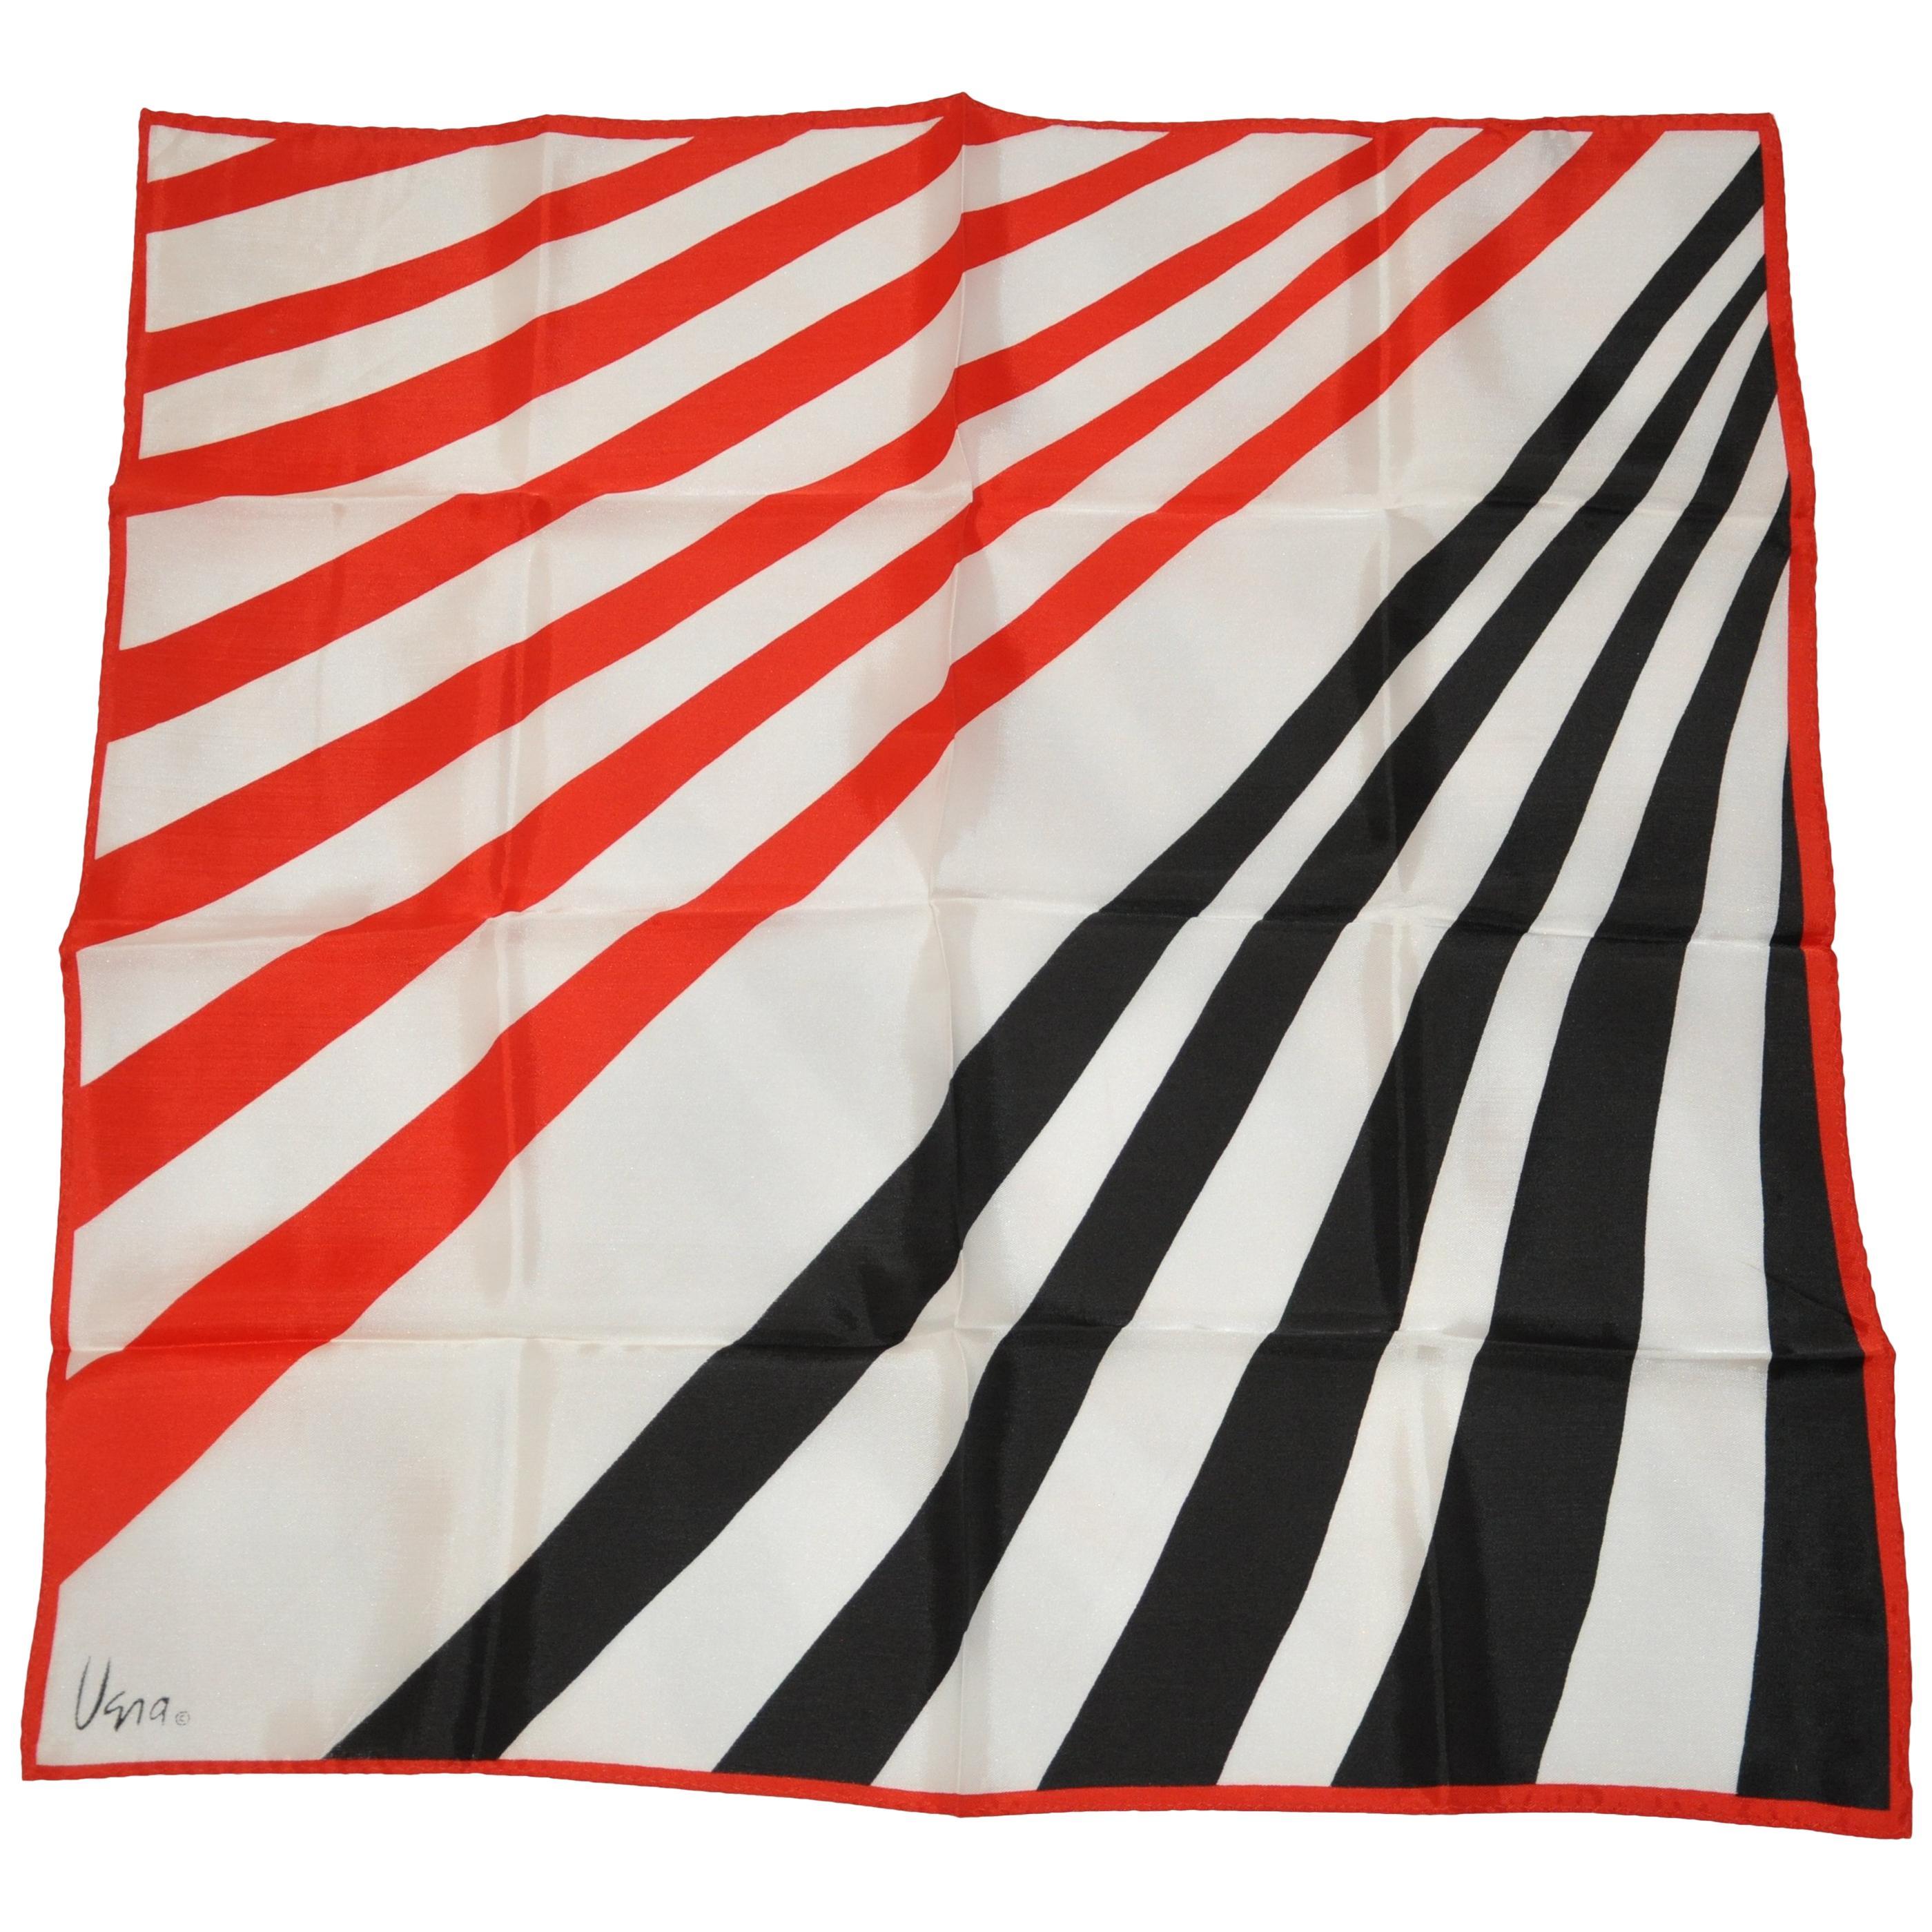 Vera Bold Patriotic Red White & Blue Multi-Striped Scarf